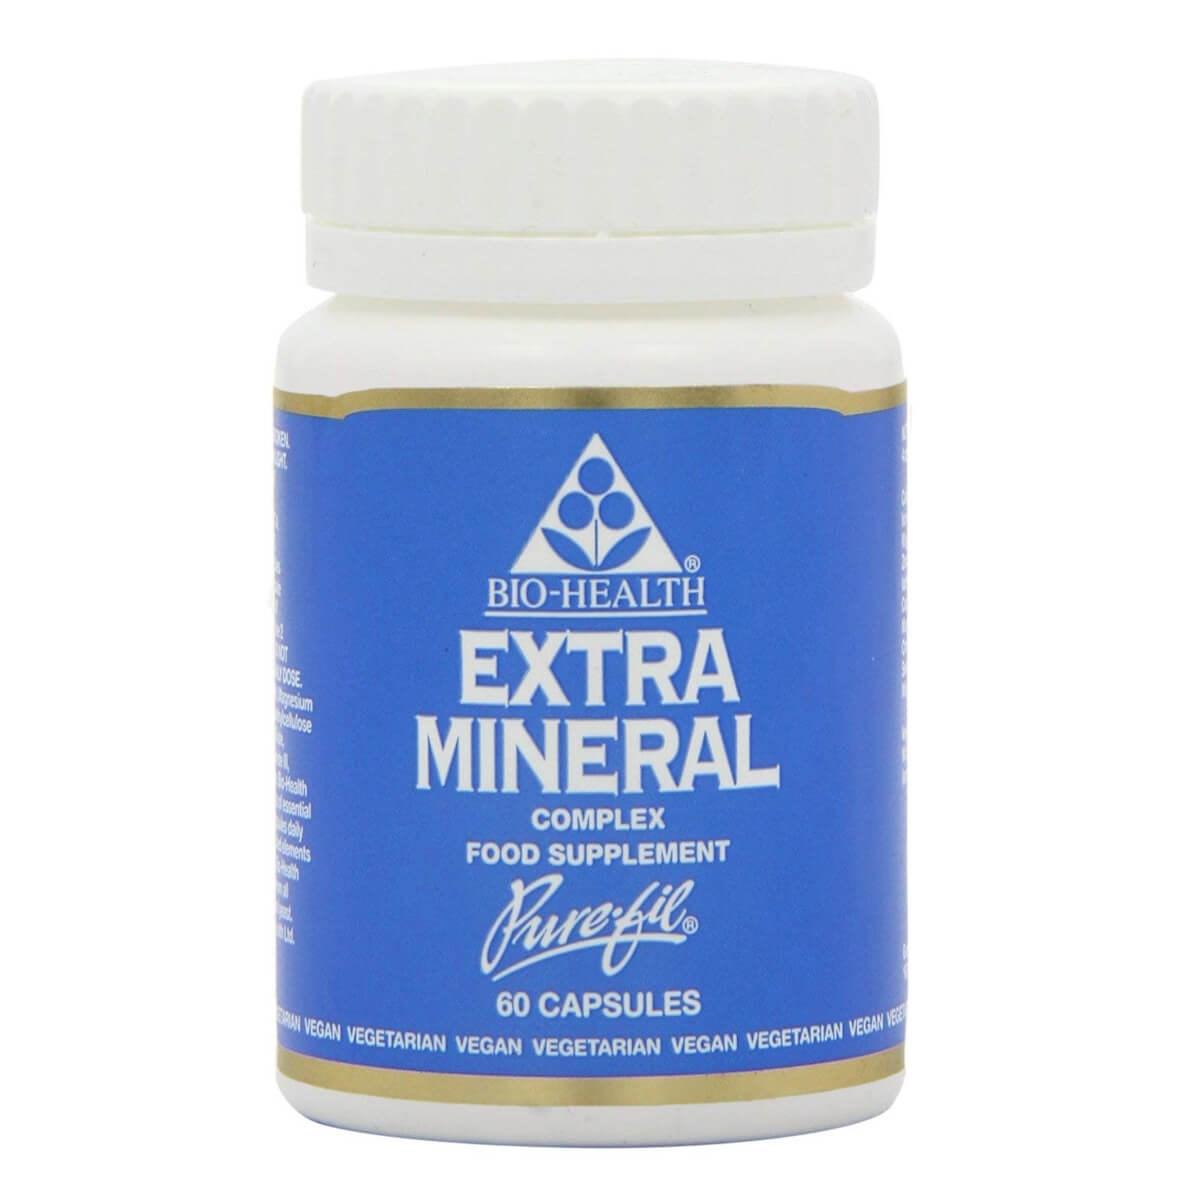 Bio-Health Extra Mineral Complex in Capsules